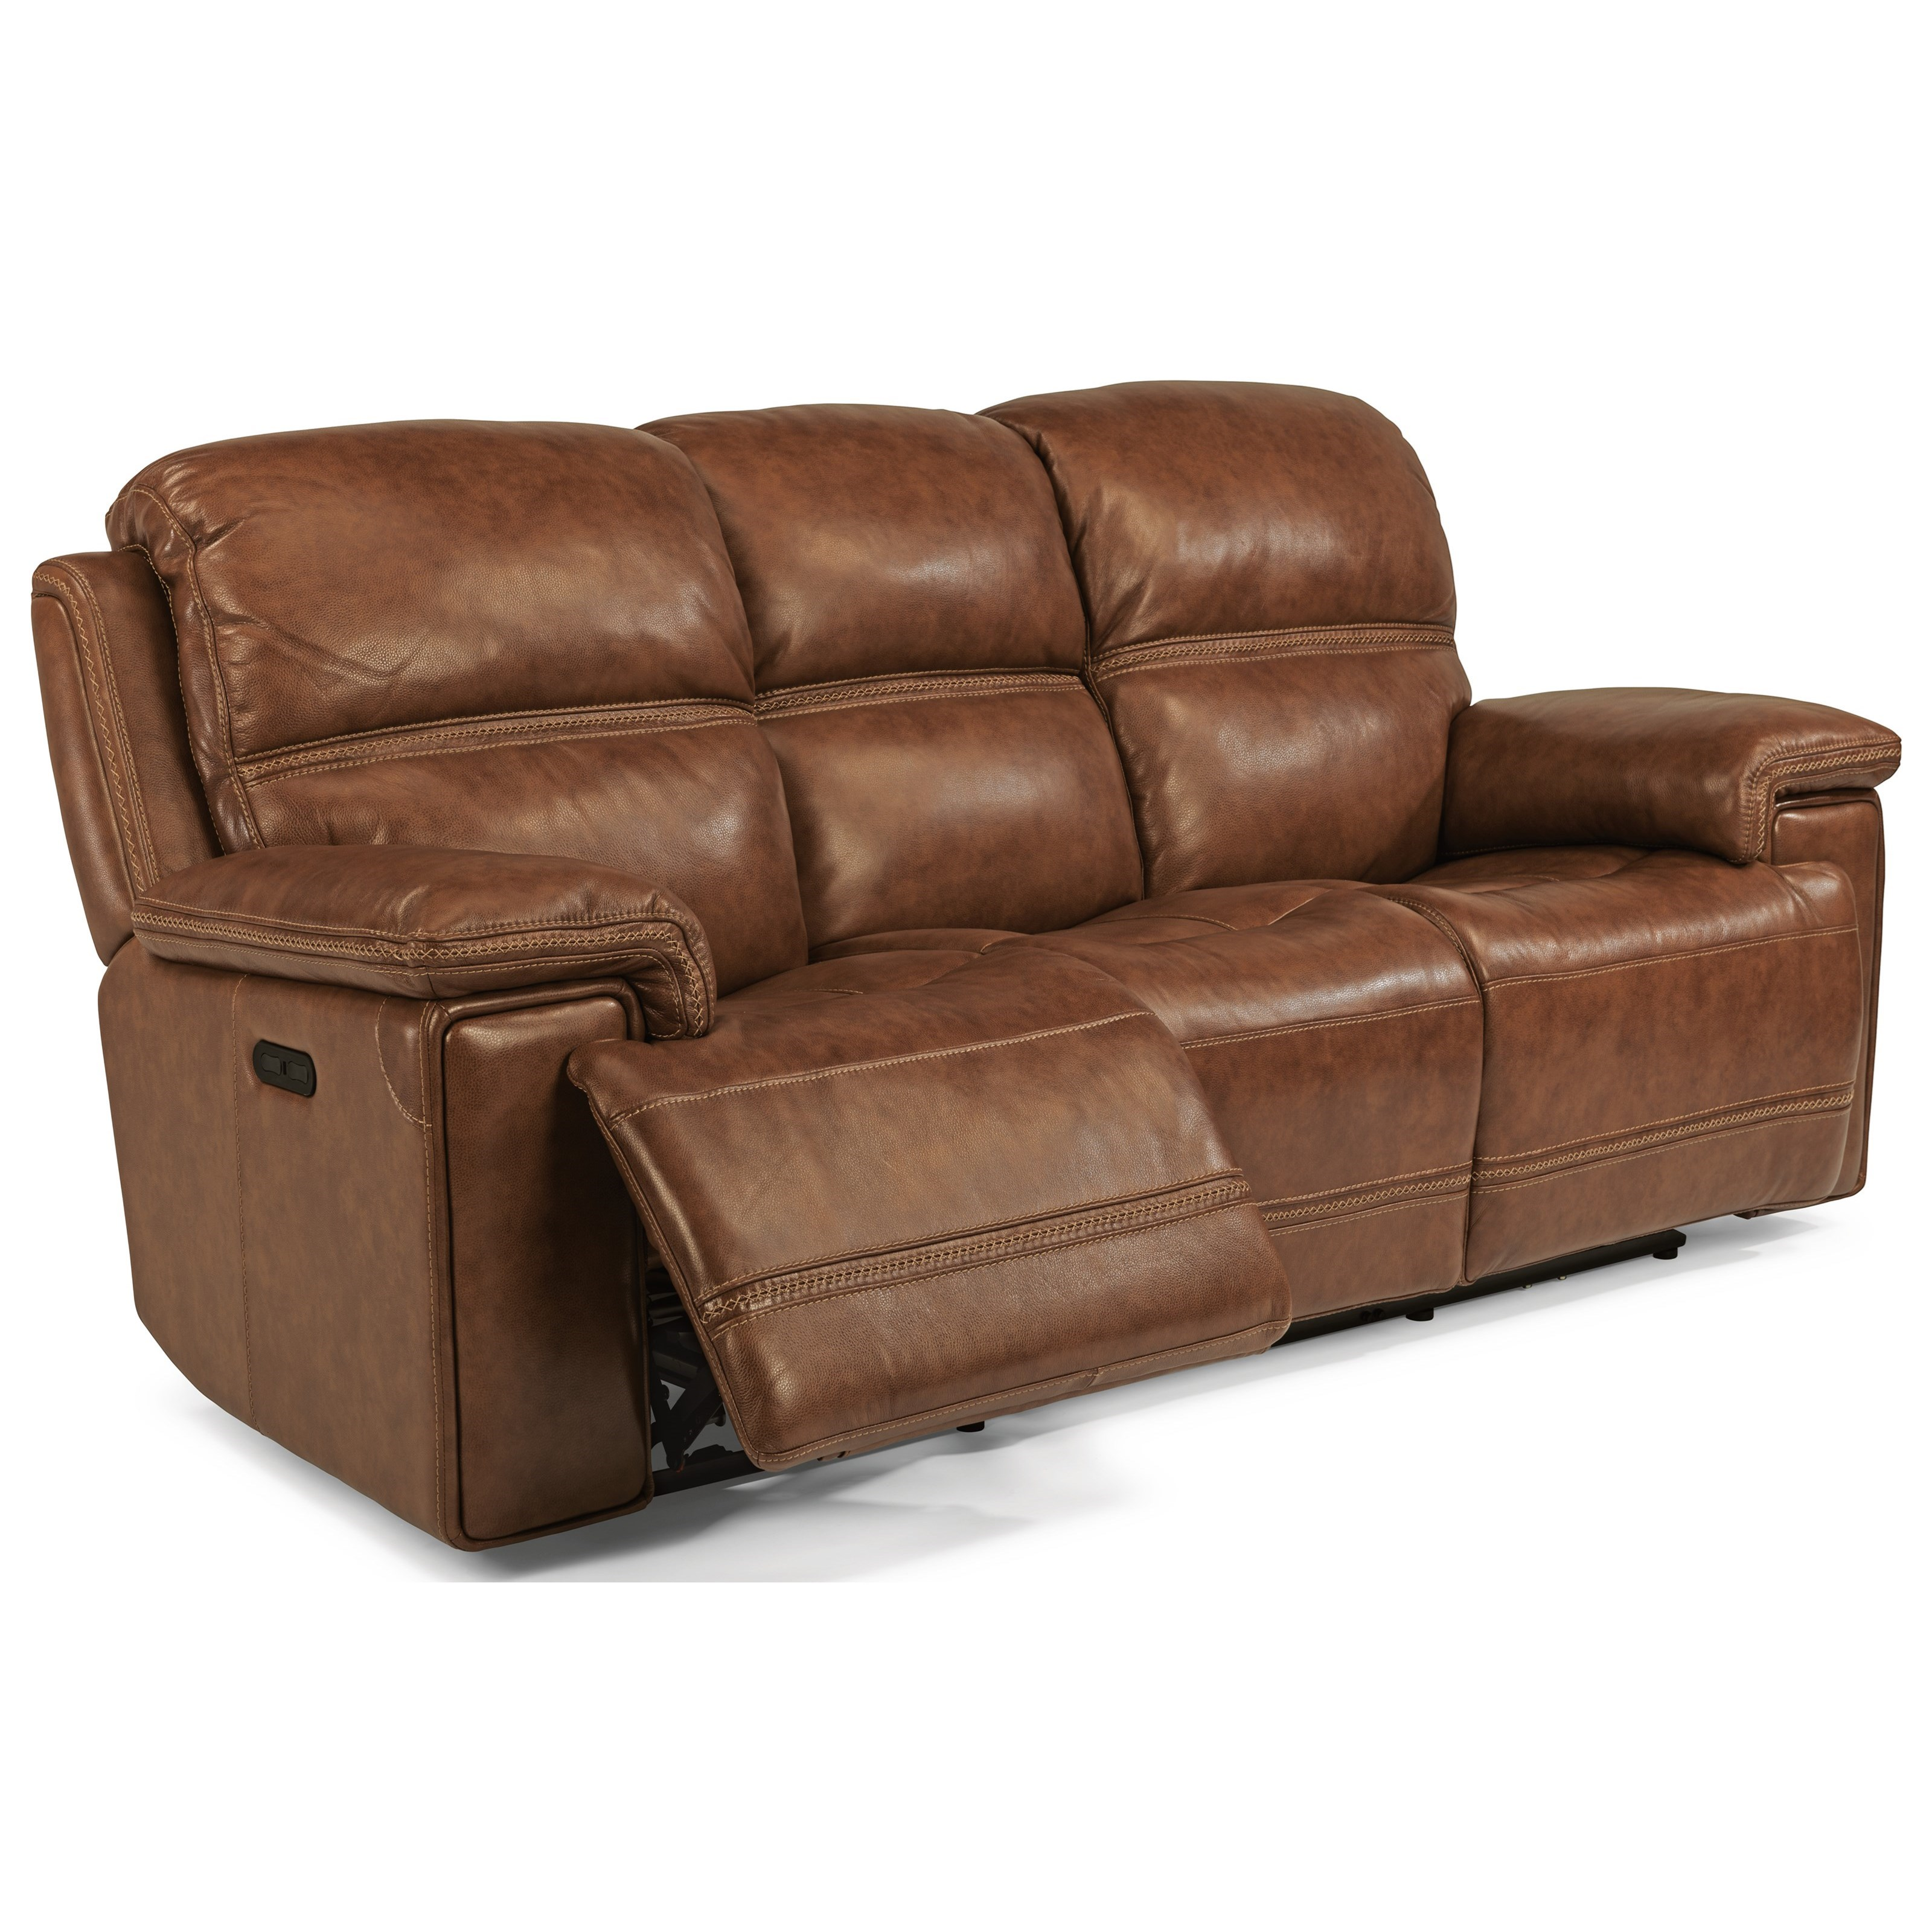 Sensational Power Reclining Sofa With Power Tilt Headrest And Usb Port Ibusinesslaw Wood Chair Design Ideas Ibusinesslaworg